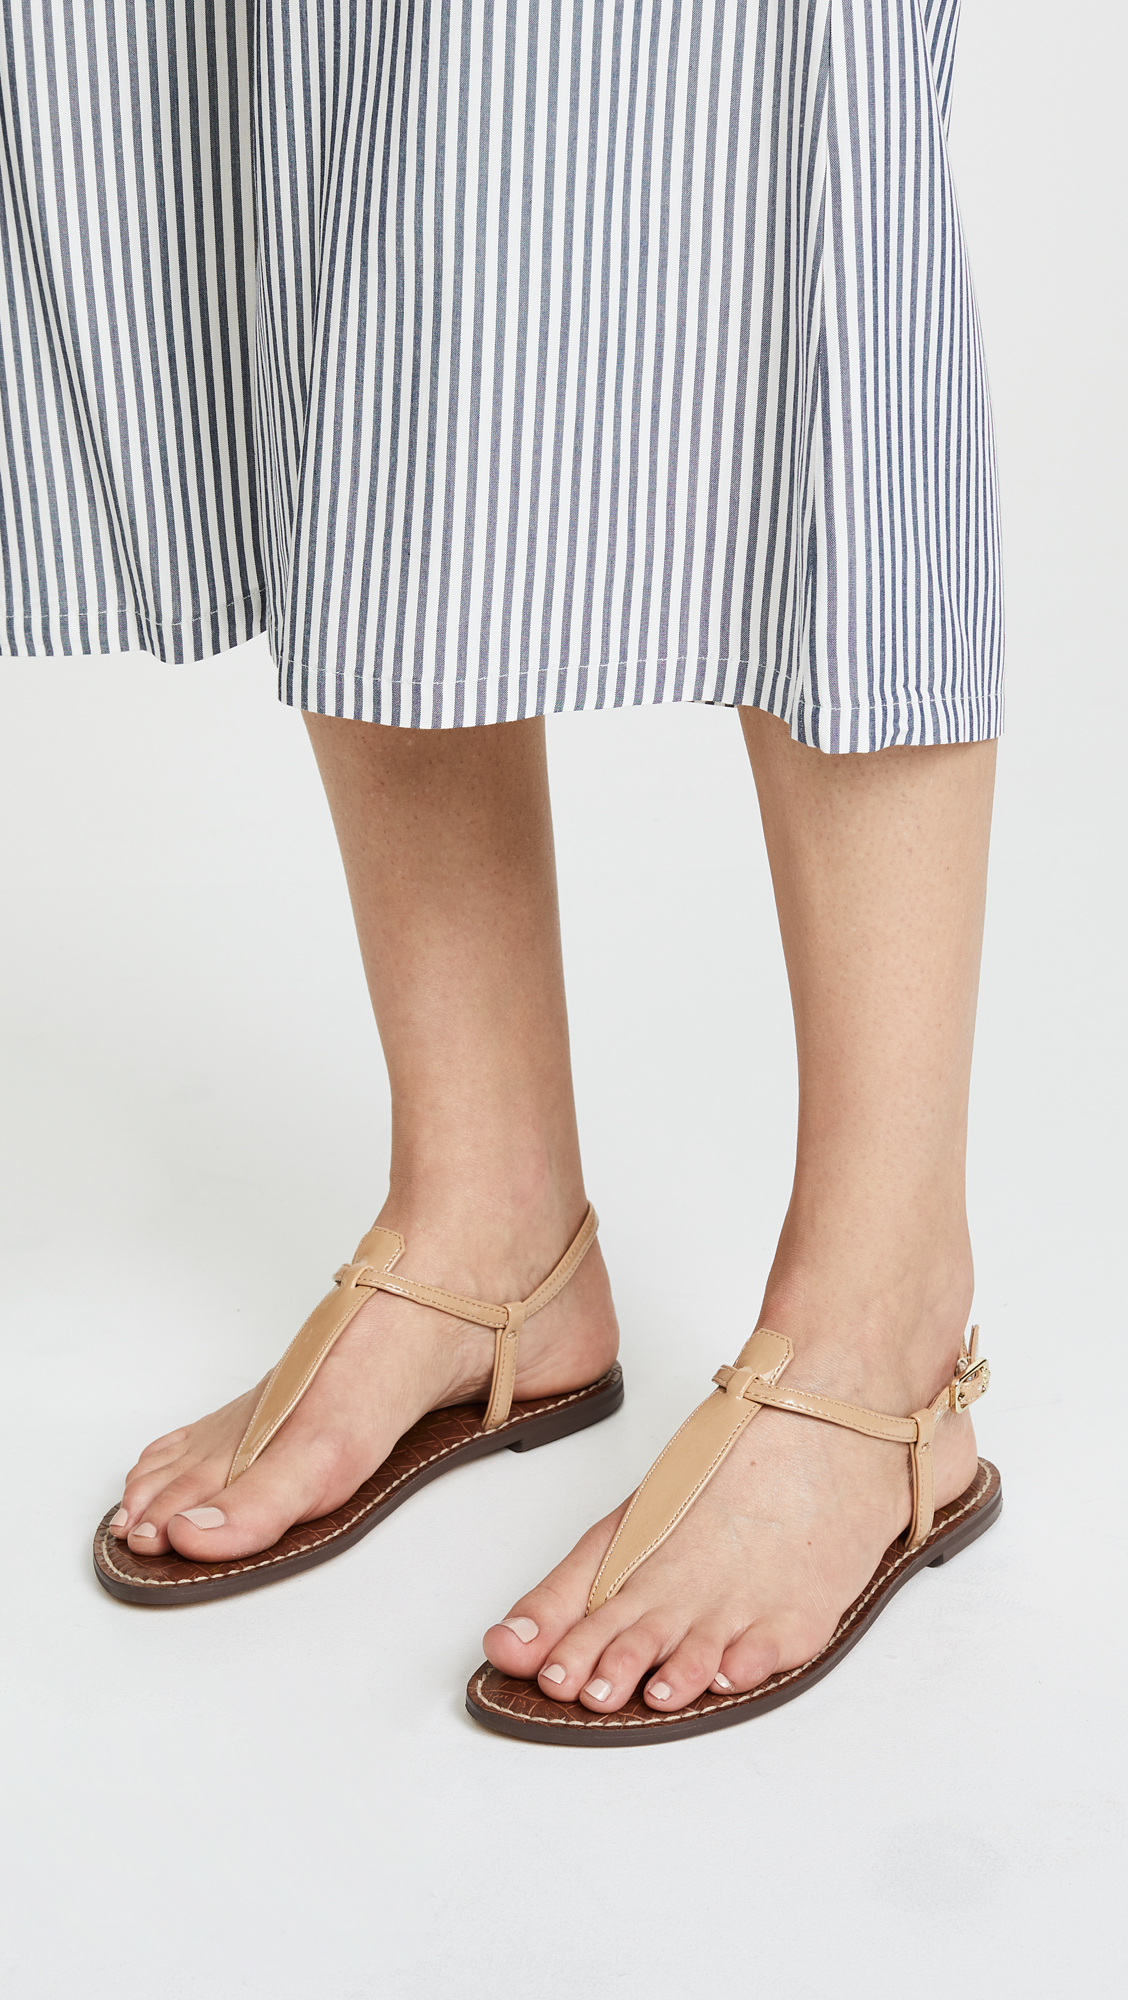 86d9d858b11f4 Sam Edelman Gigi Patent T Strap Sandals